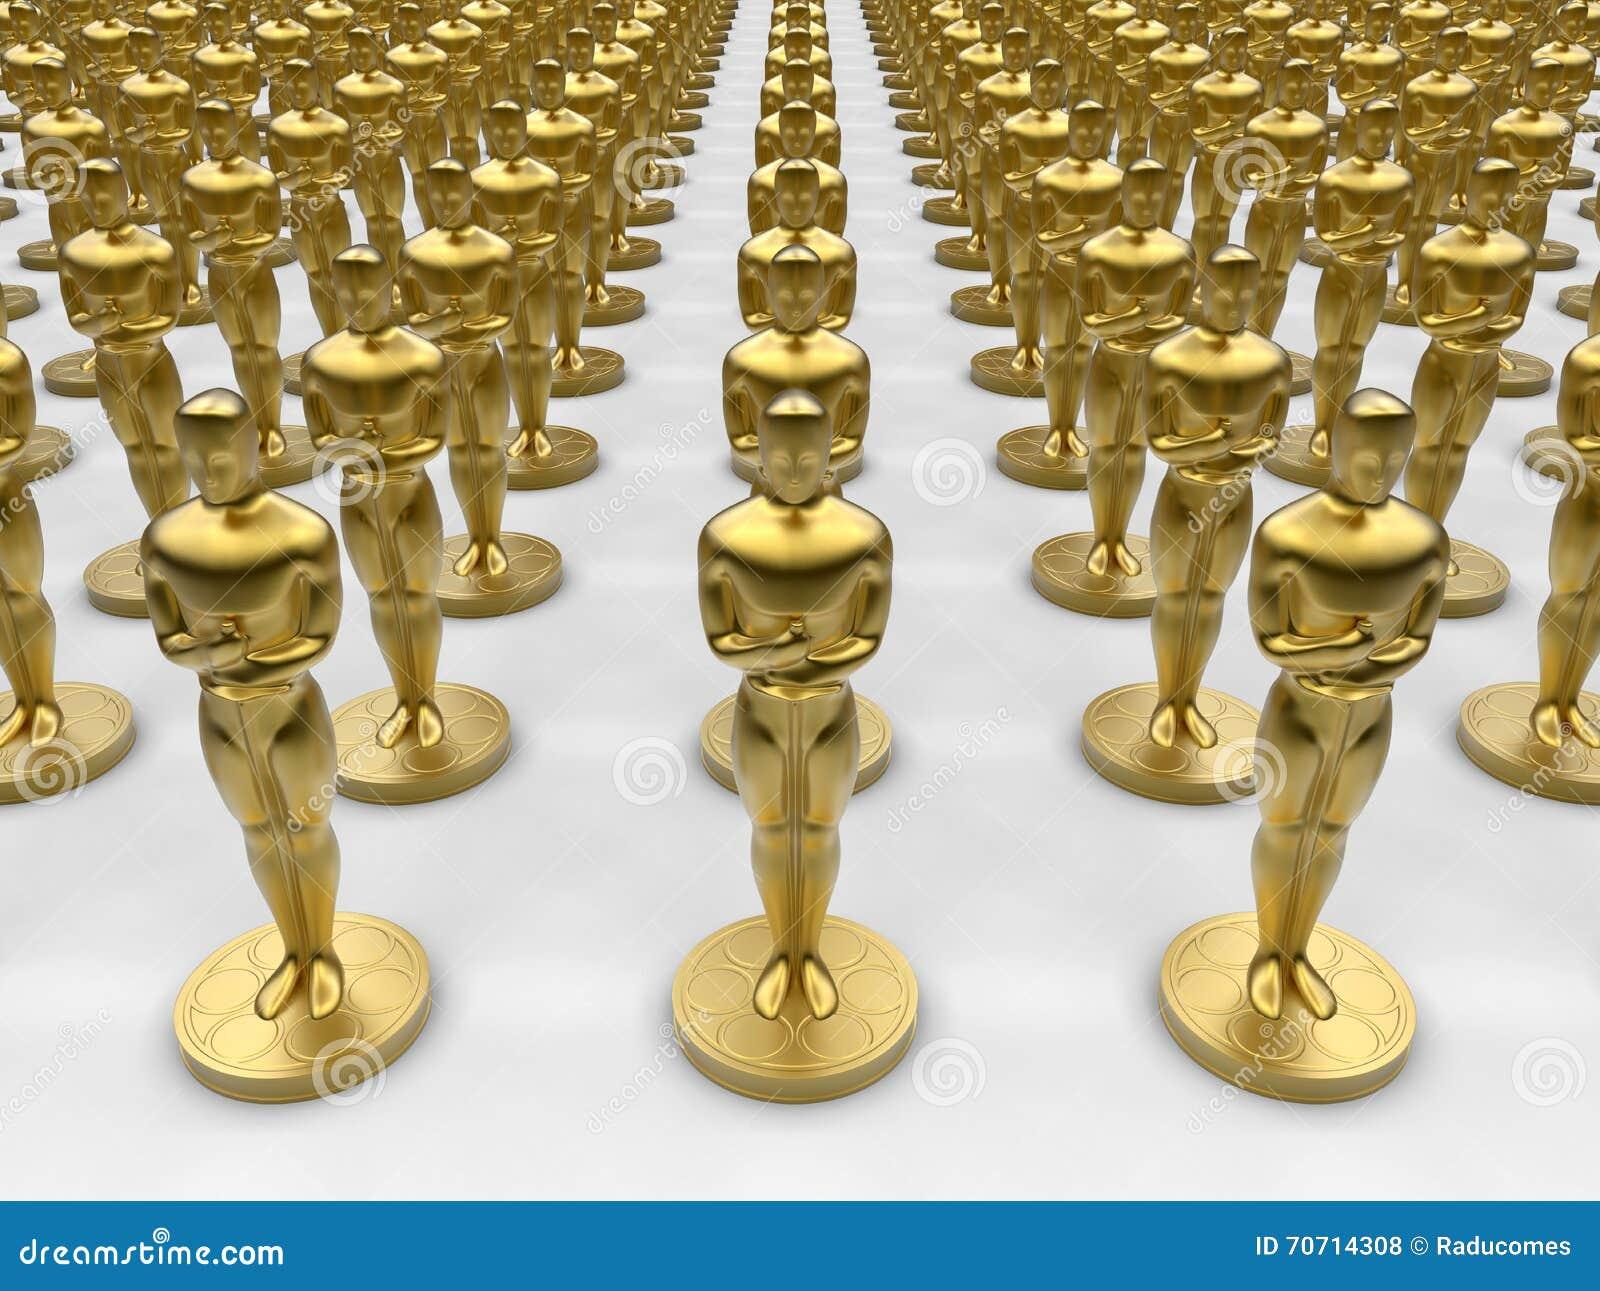 oscar statue collection stock illustration illustration of golden